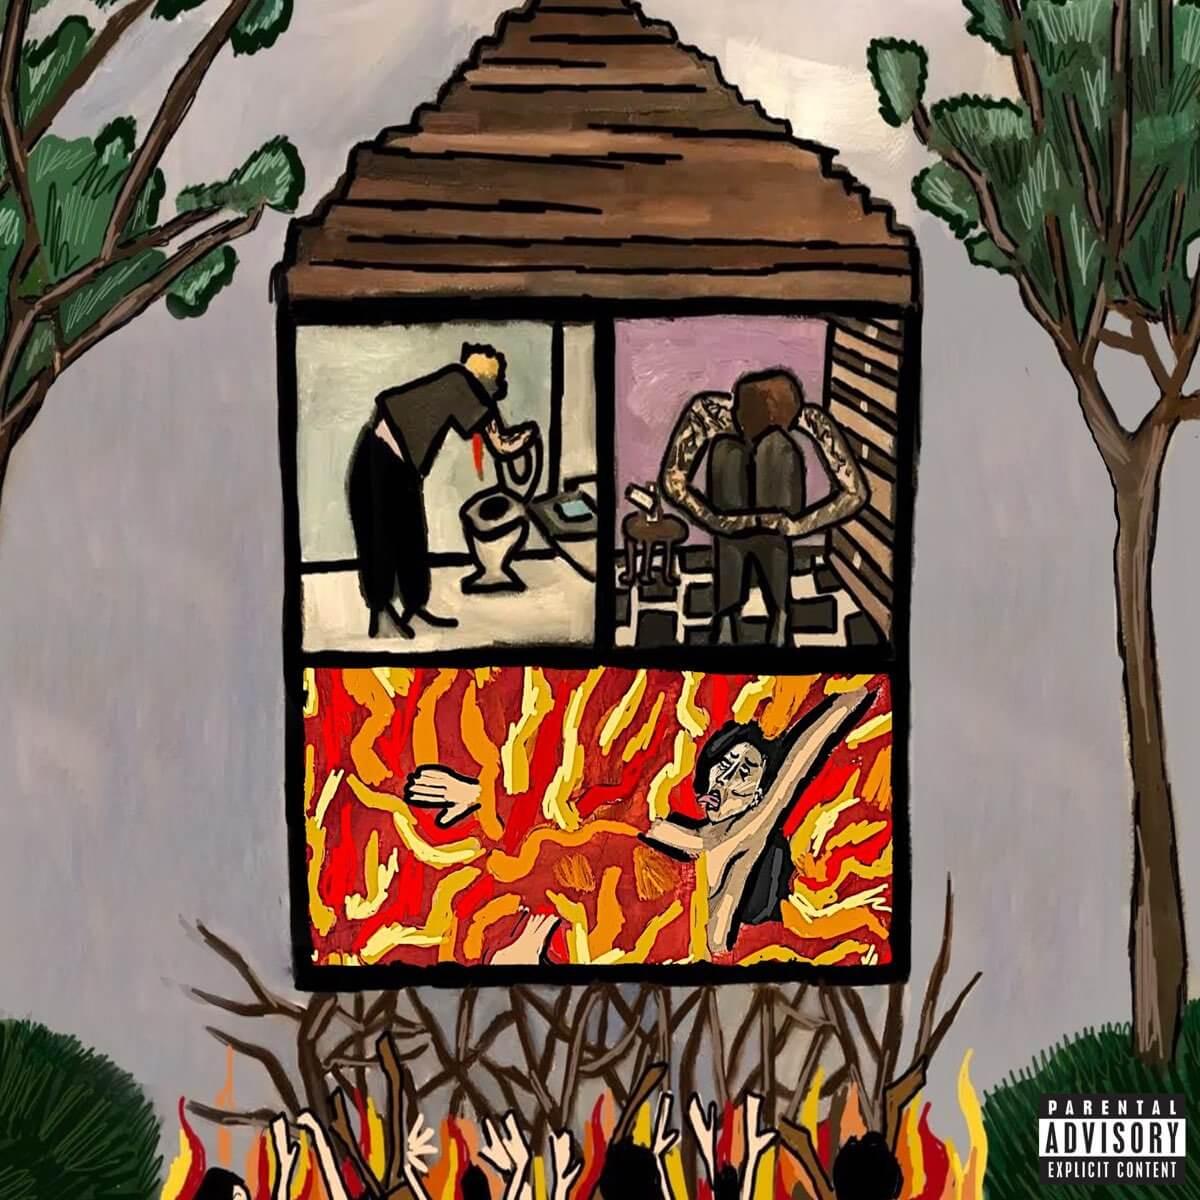 $uicideboy$ - Degeneration In The Key Of A Minor Lyrics